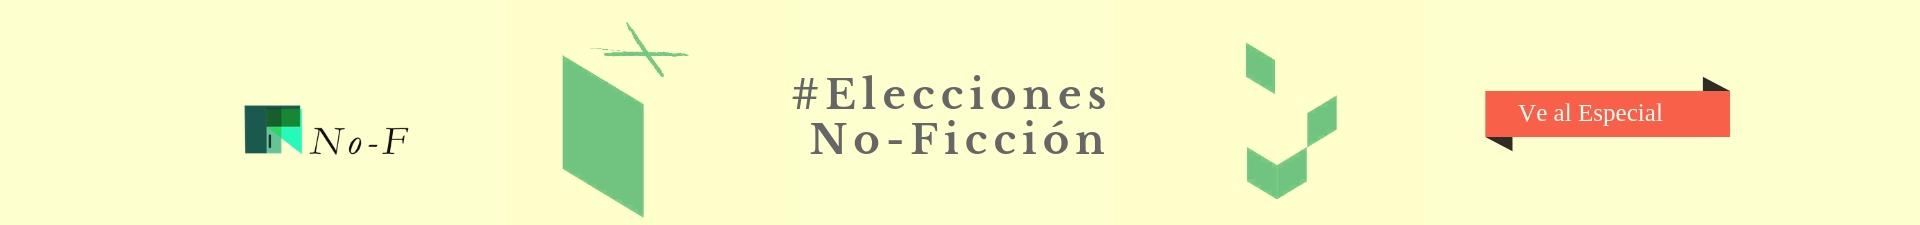 Banner electoral 2